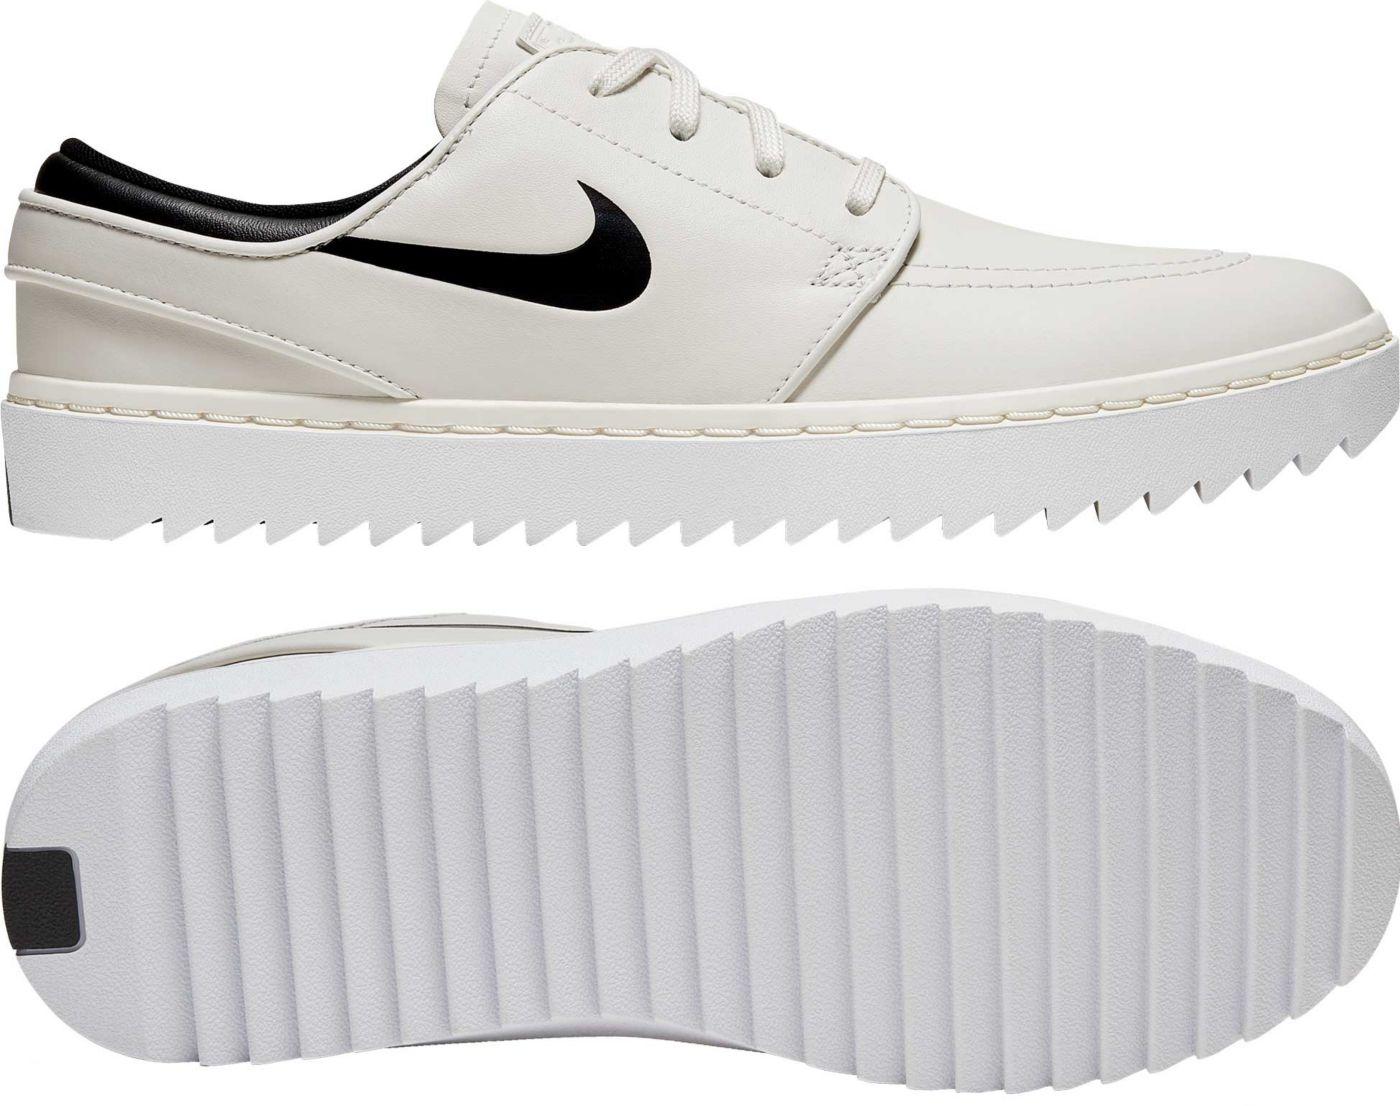 Nike Men's Janoski G Golf Shoes